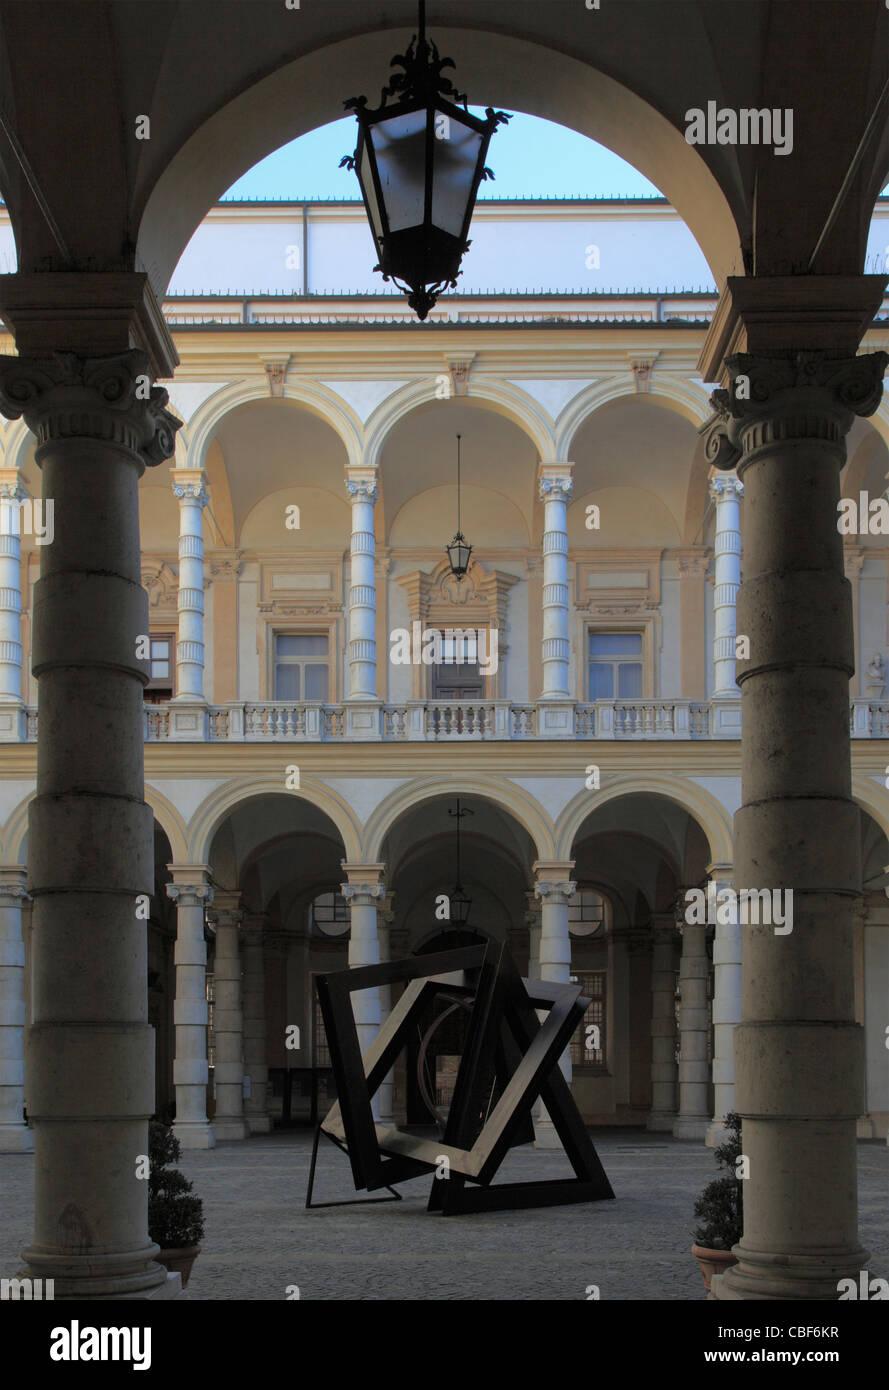 Italy, Piedmont, Turin, University, Palazzo del Rettorato, Stock Photo